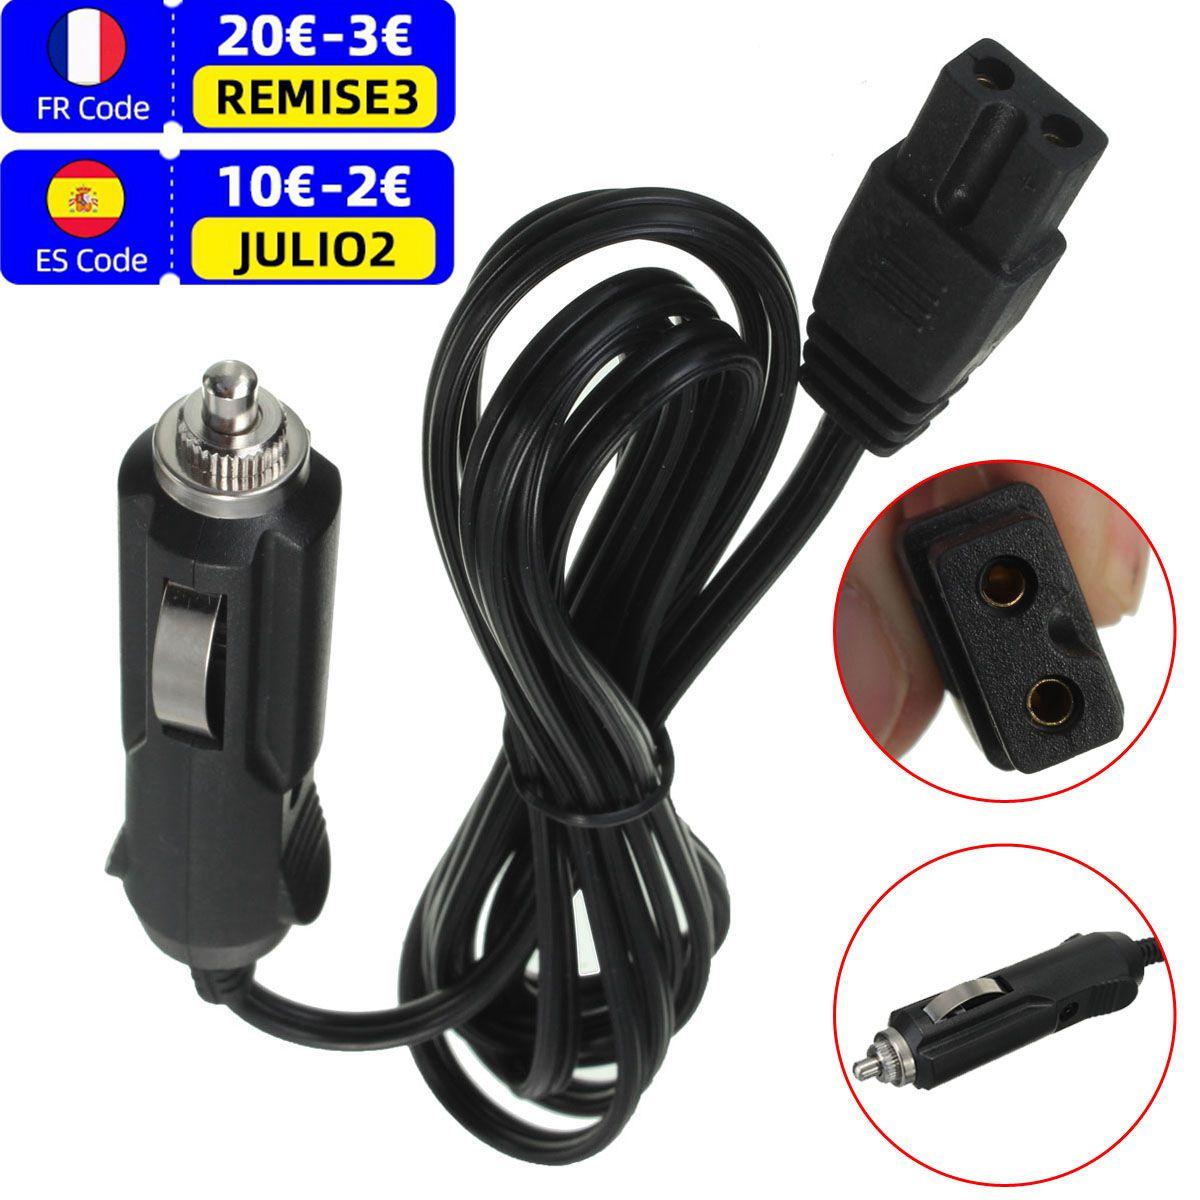 12V 2m DC Lead Cable Plug Wire Bumper Replacement Car Cooler Cool Box Mini Fridge Cigar Lighter Plug